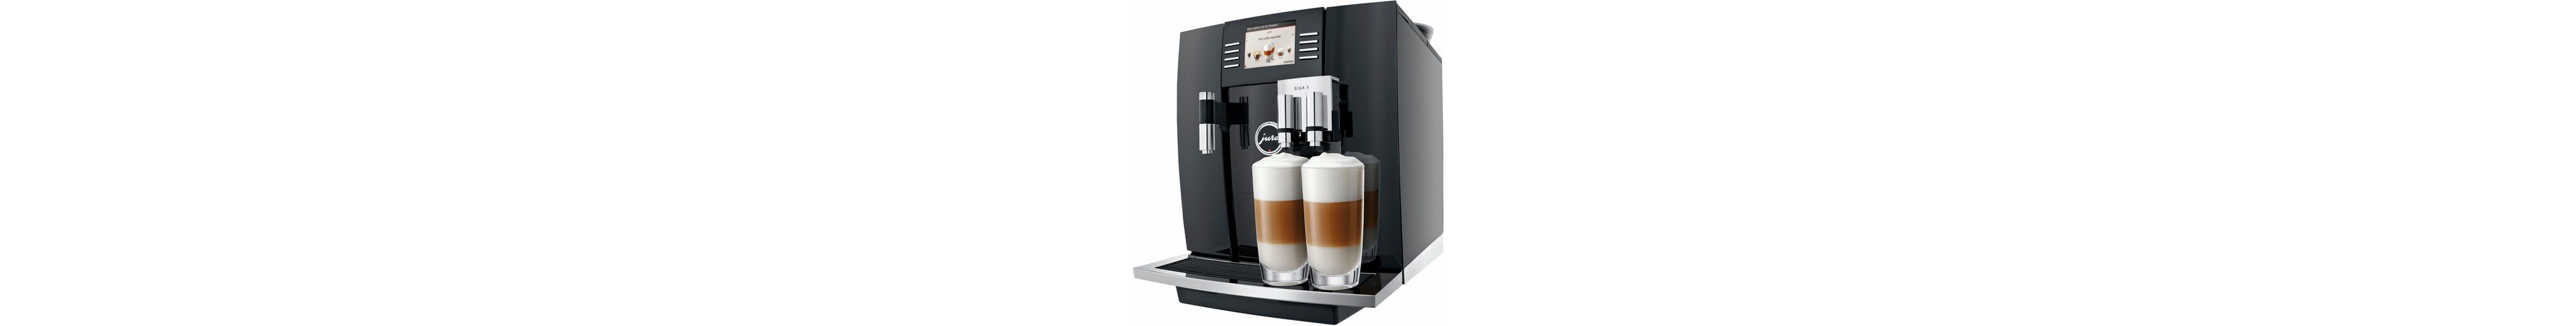 Jura Espresso-/Kaffee-Vollautomat GIGA 5, piano black